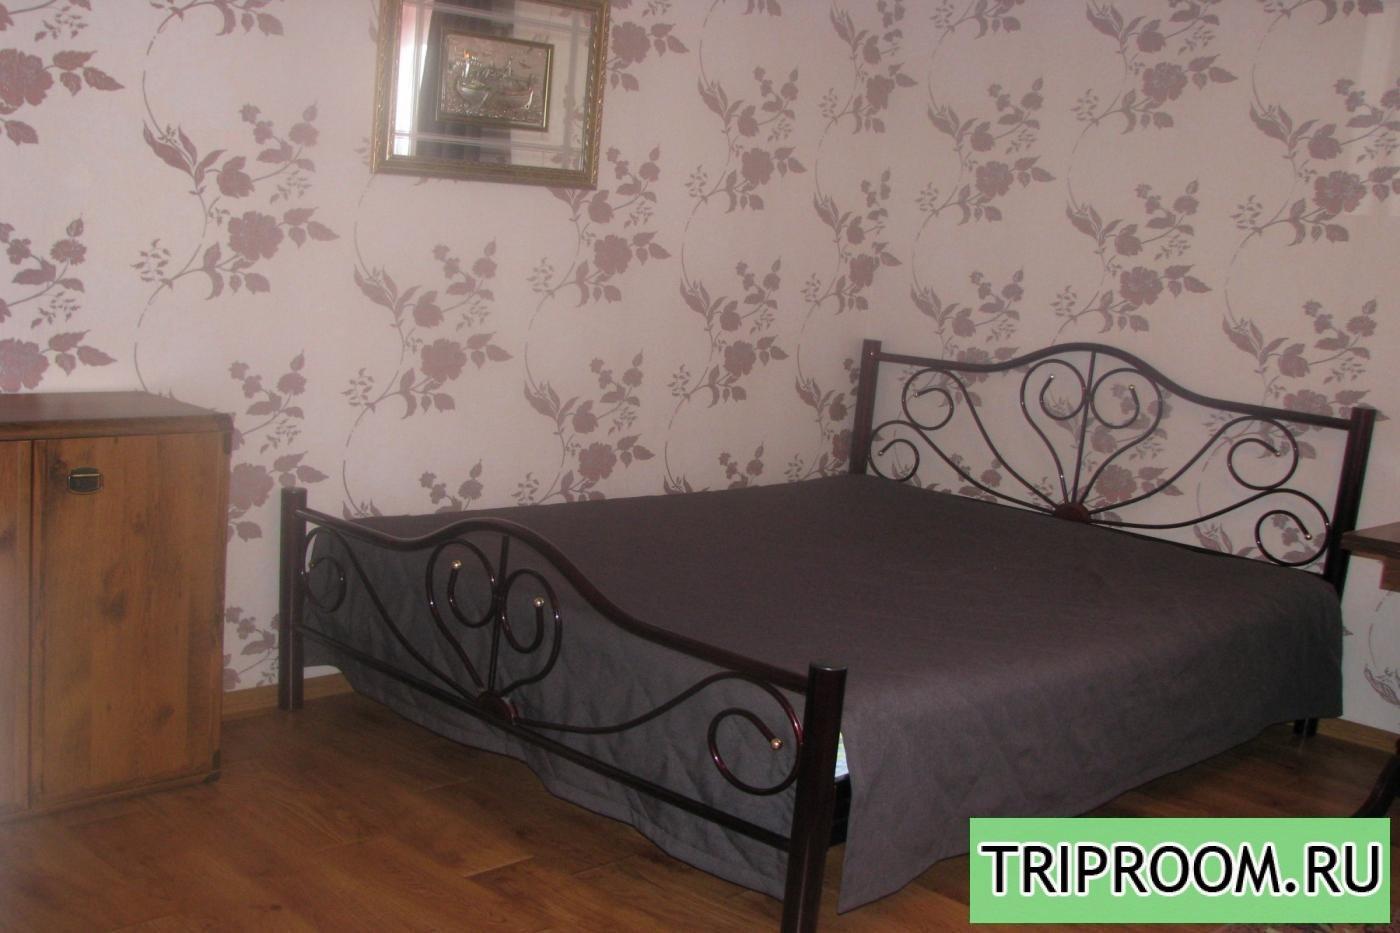 1-комнатная квартира посуточно (вариант № 15422), ул. Кожанова улица, фото № 1